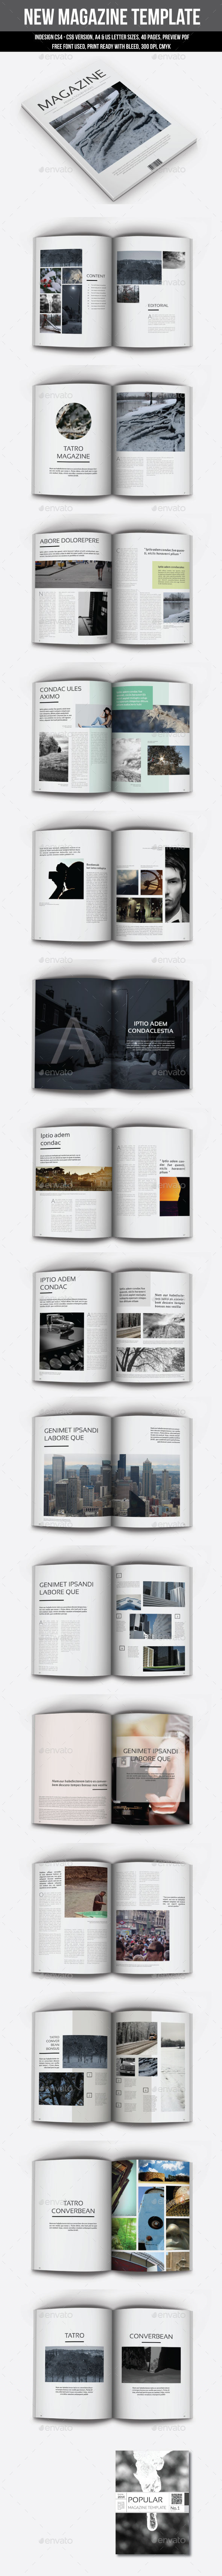 New Magazine Template - Magazines Print Templates